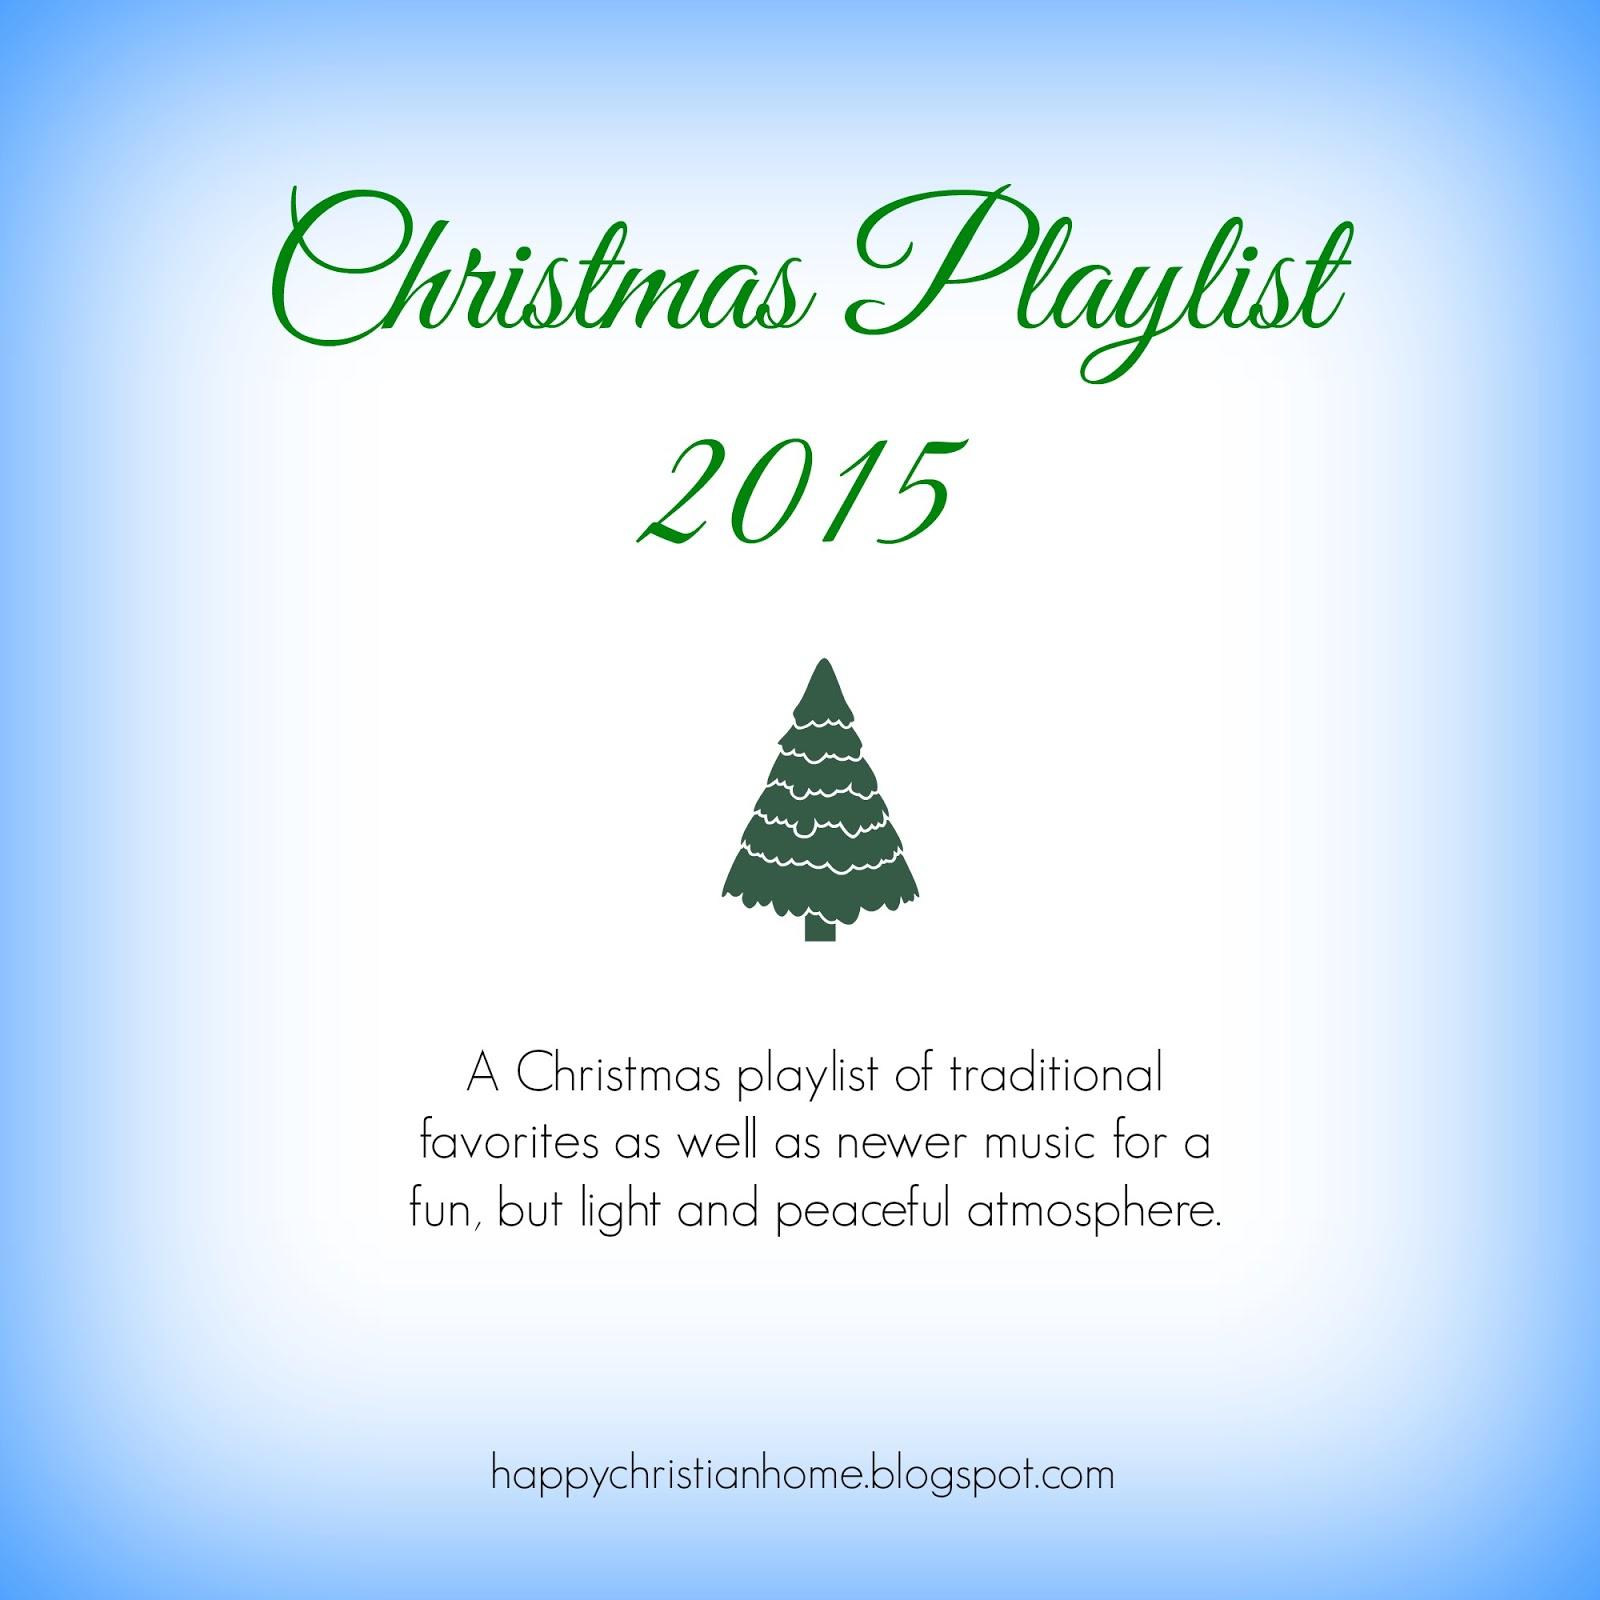 christian christmas music youtube playlist - Youtube Christian Christmas Music